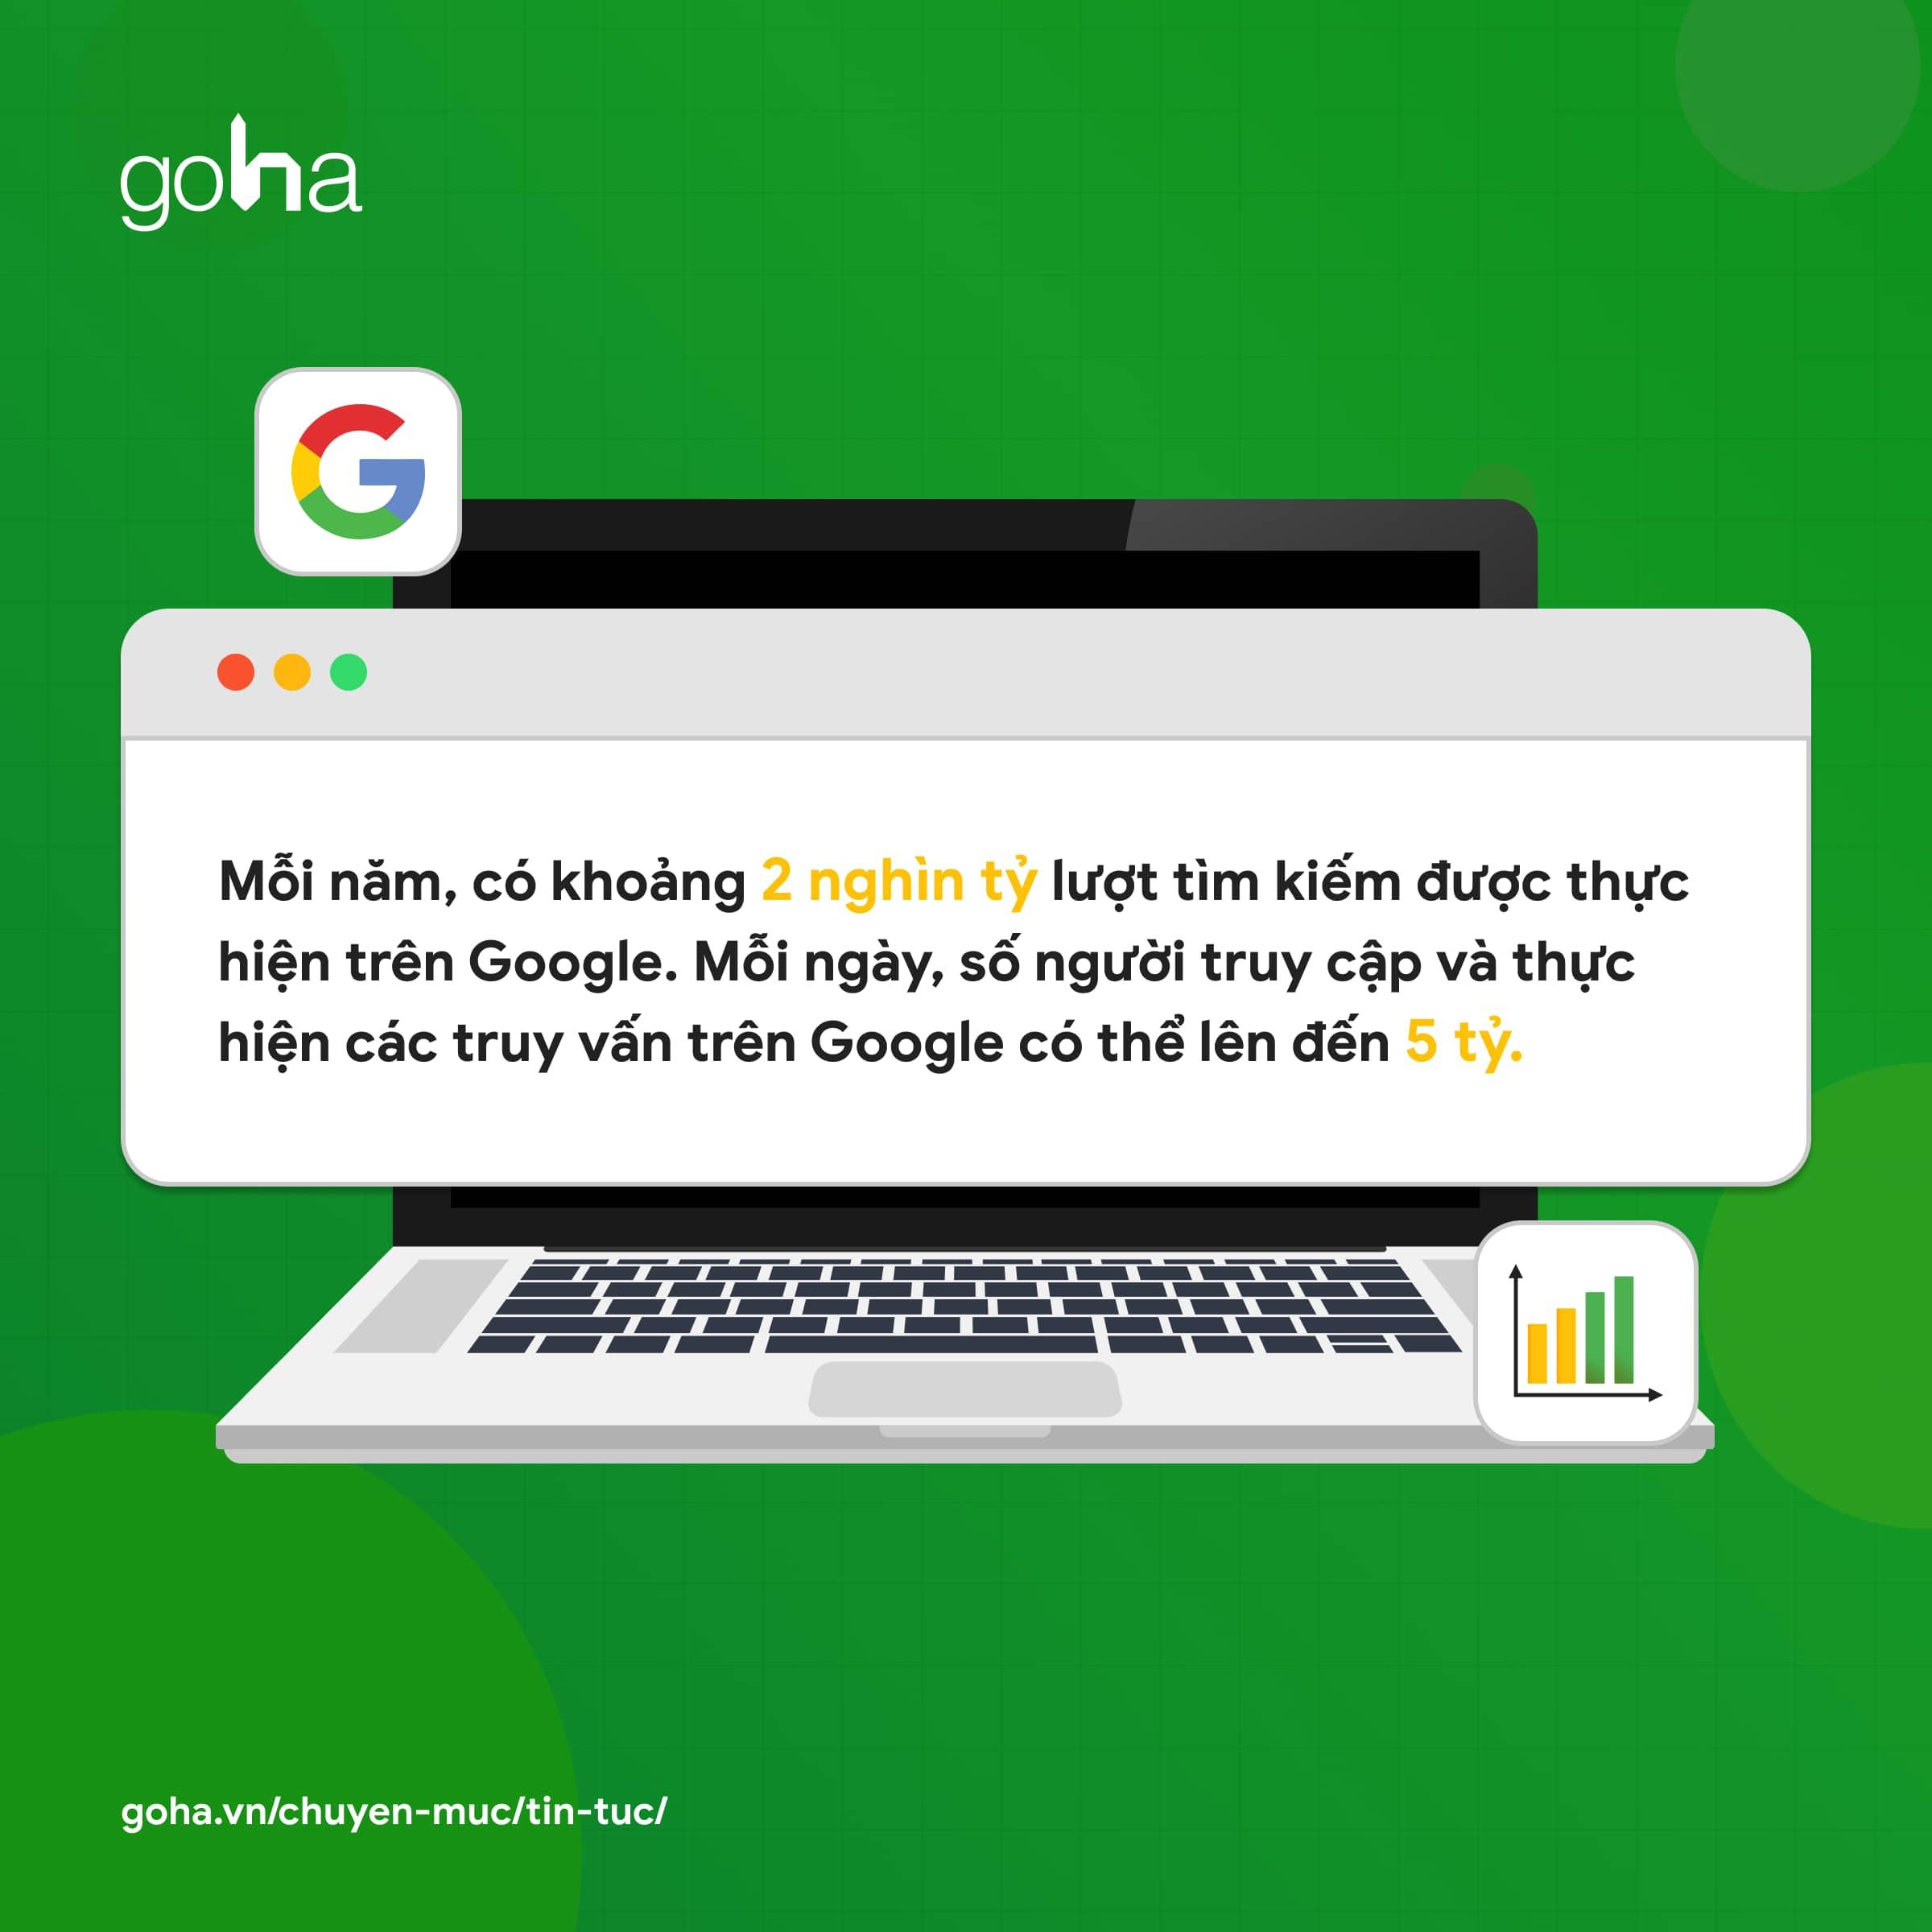 google-la-website-co-luot-truy-cap-khong-lo